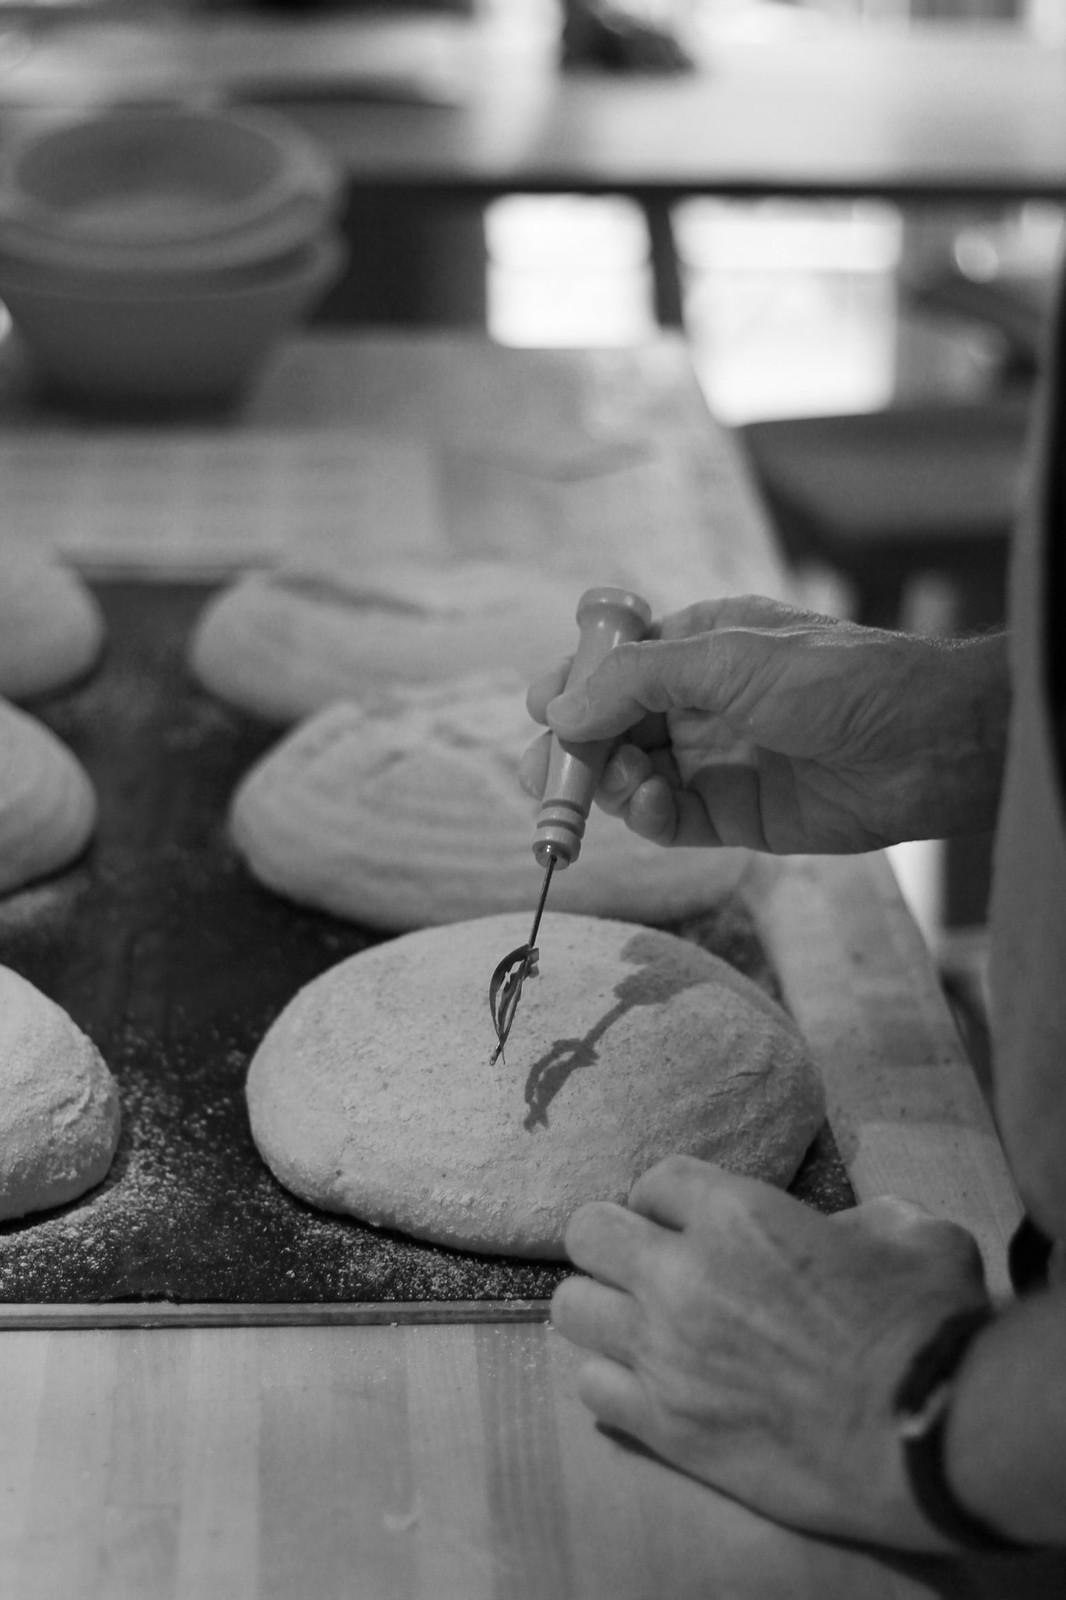 Scoring dough